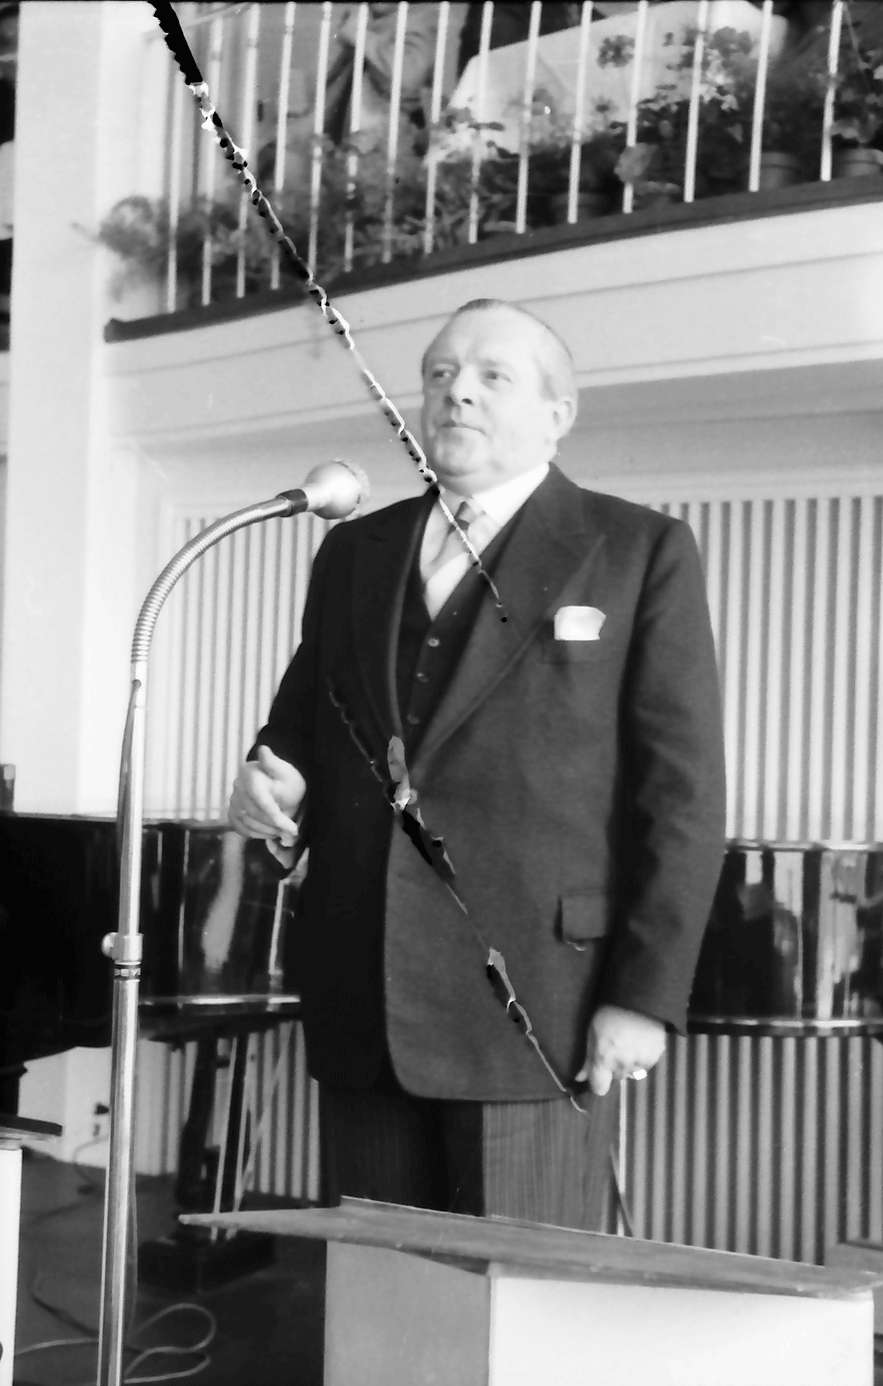 Freudenstadt: Kurhaus; Wirtschaftsminister Veit am Mikrofon, Bild 1